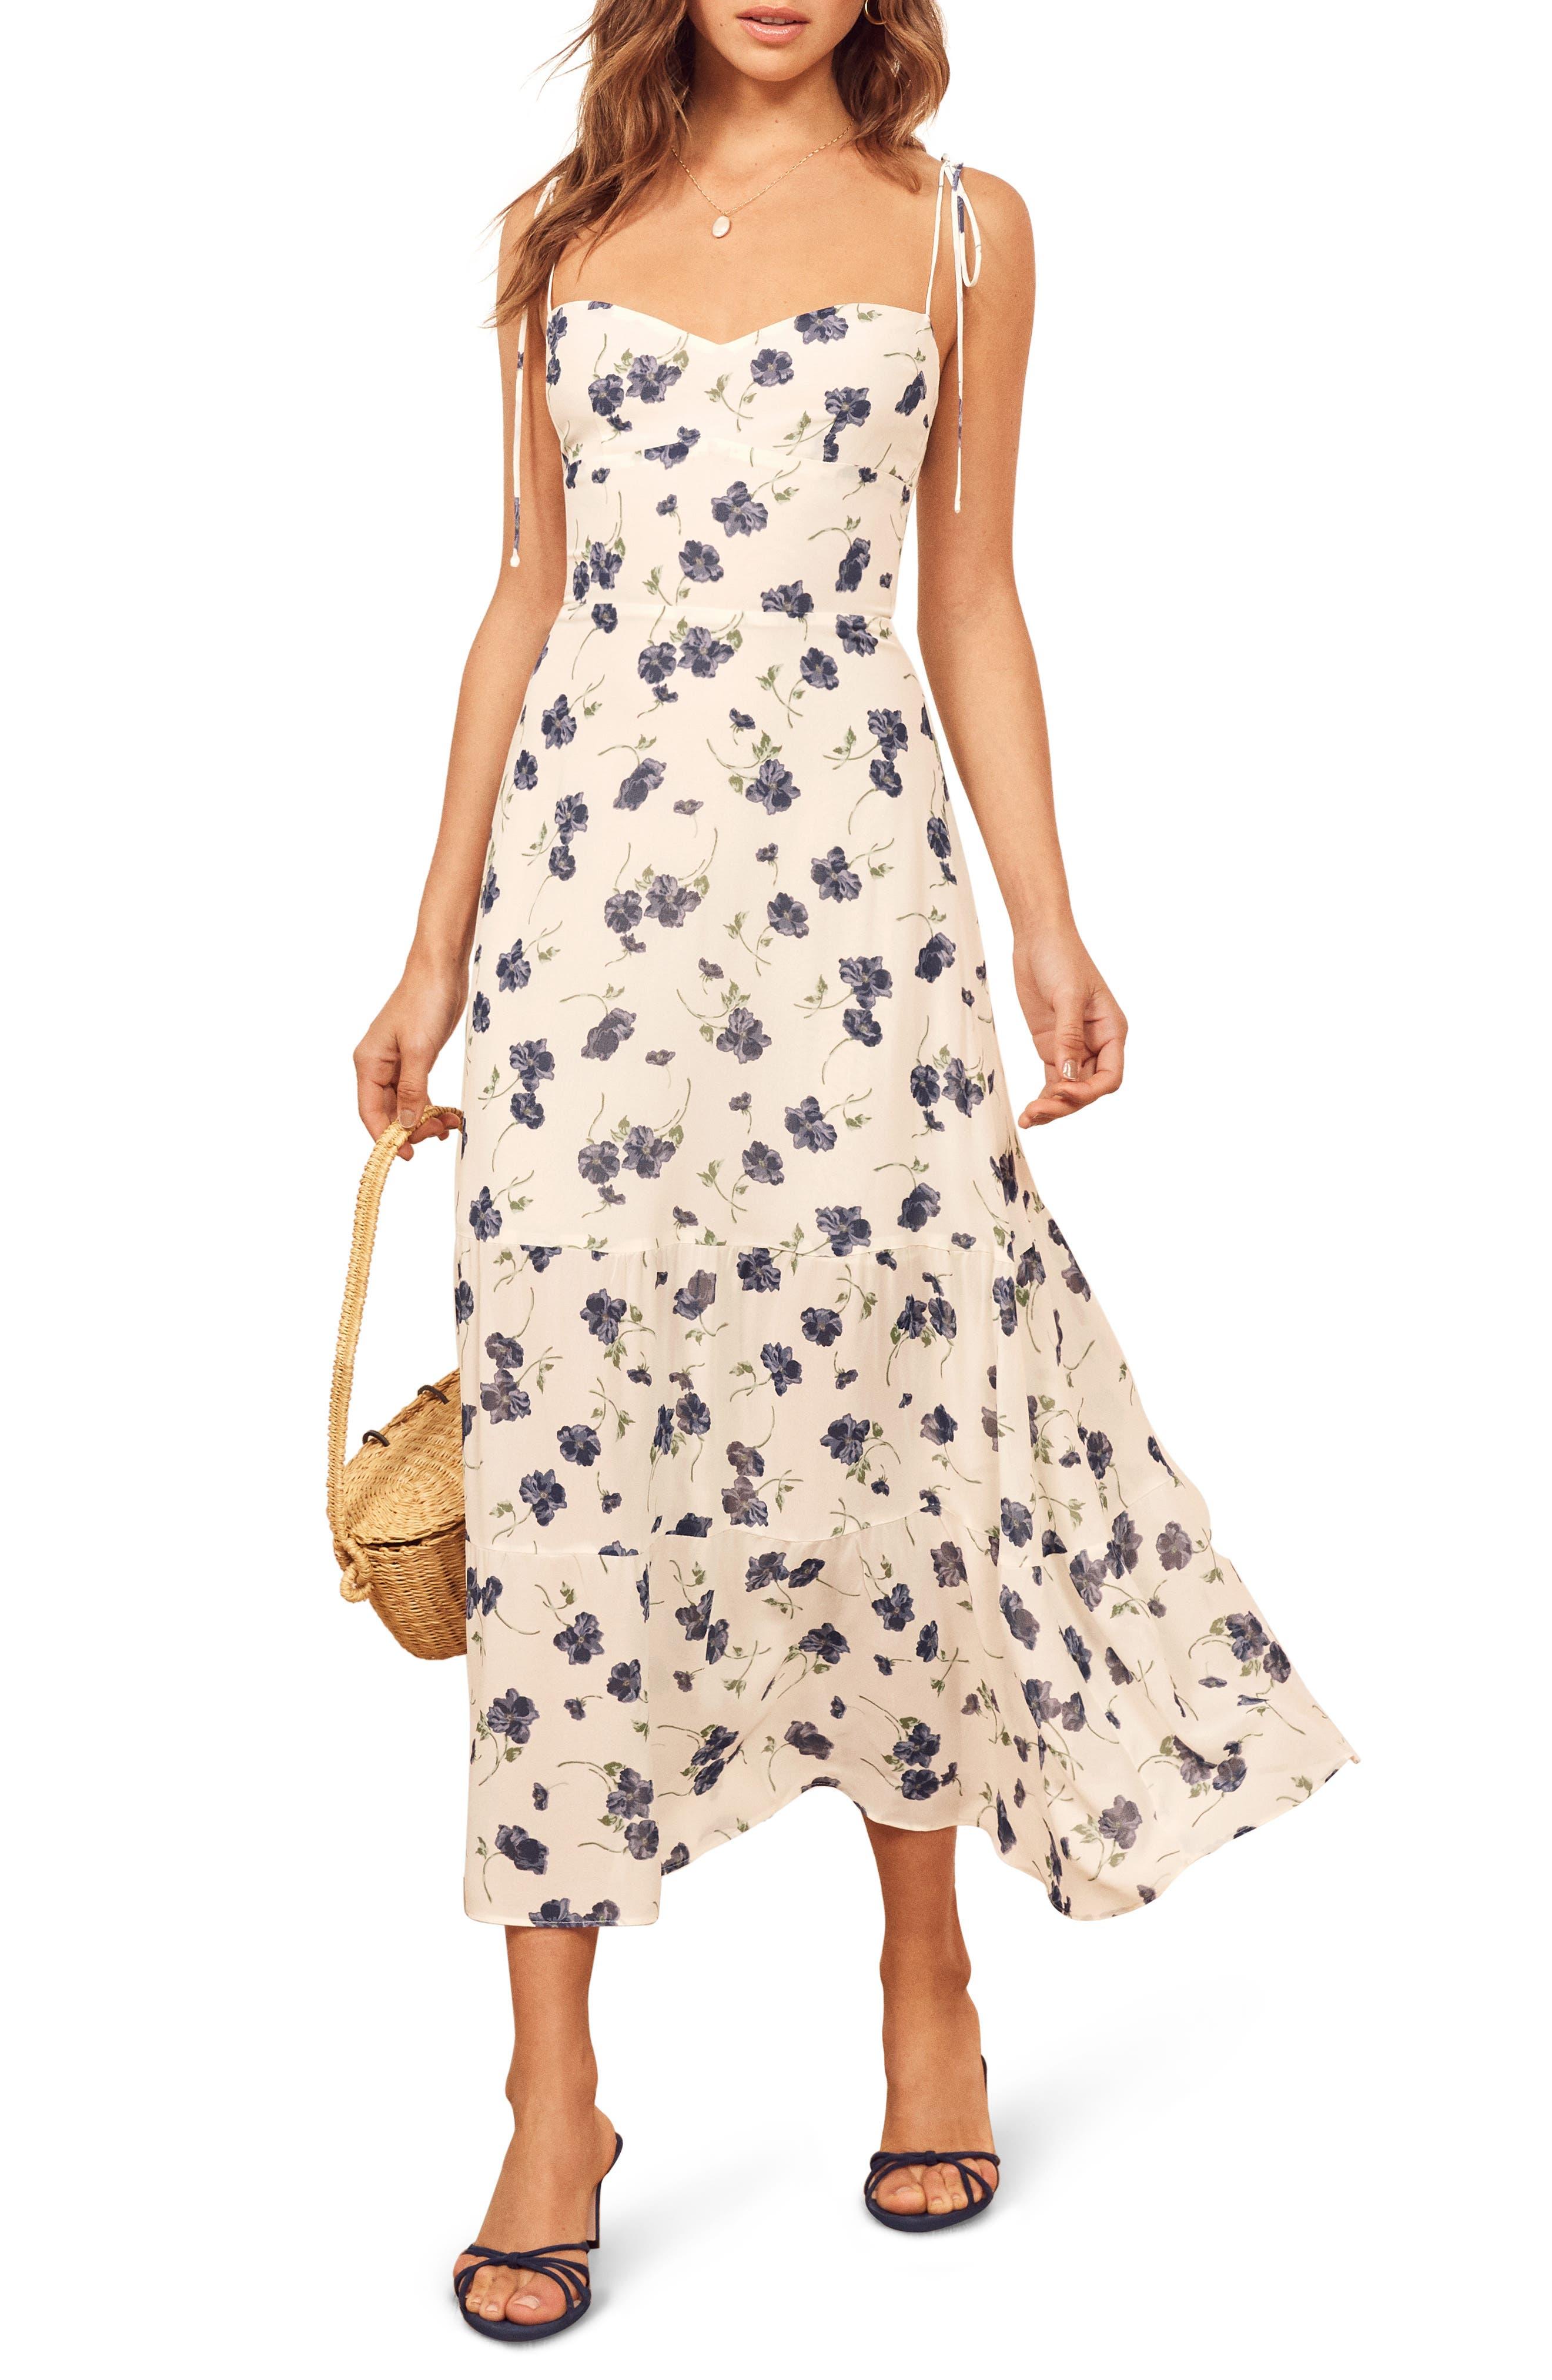 Reformation Emmie Floral Dress, White